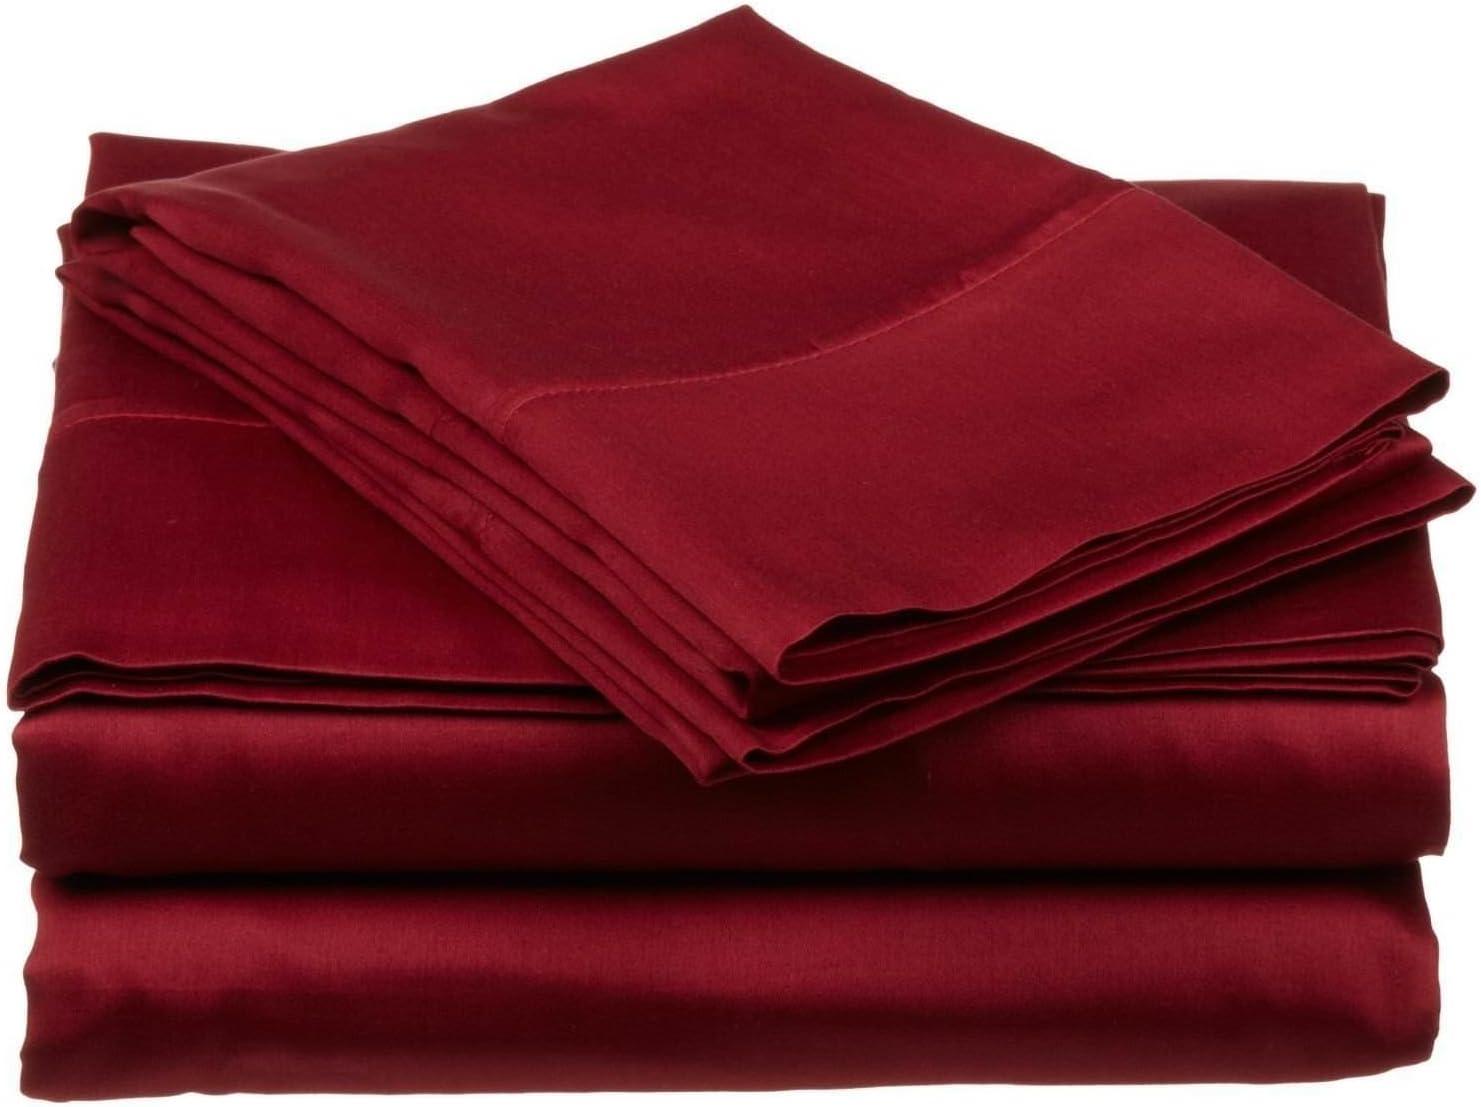 Ras Décor Linen 600-Thread-Count 100% Cotton Bed Sheets Burgundy Solid RV Short Queen Sheet Set, 4-Piece Long-Staple Combed Cotton, Breathable, Soft & Sateen Weave Fits Mattress Upto 15'' Deep Pocket